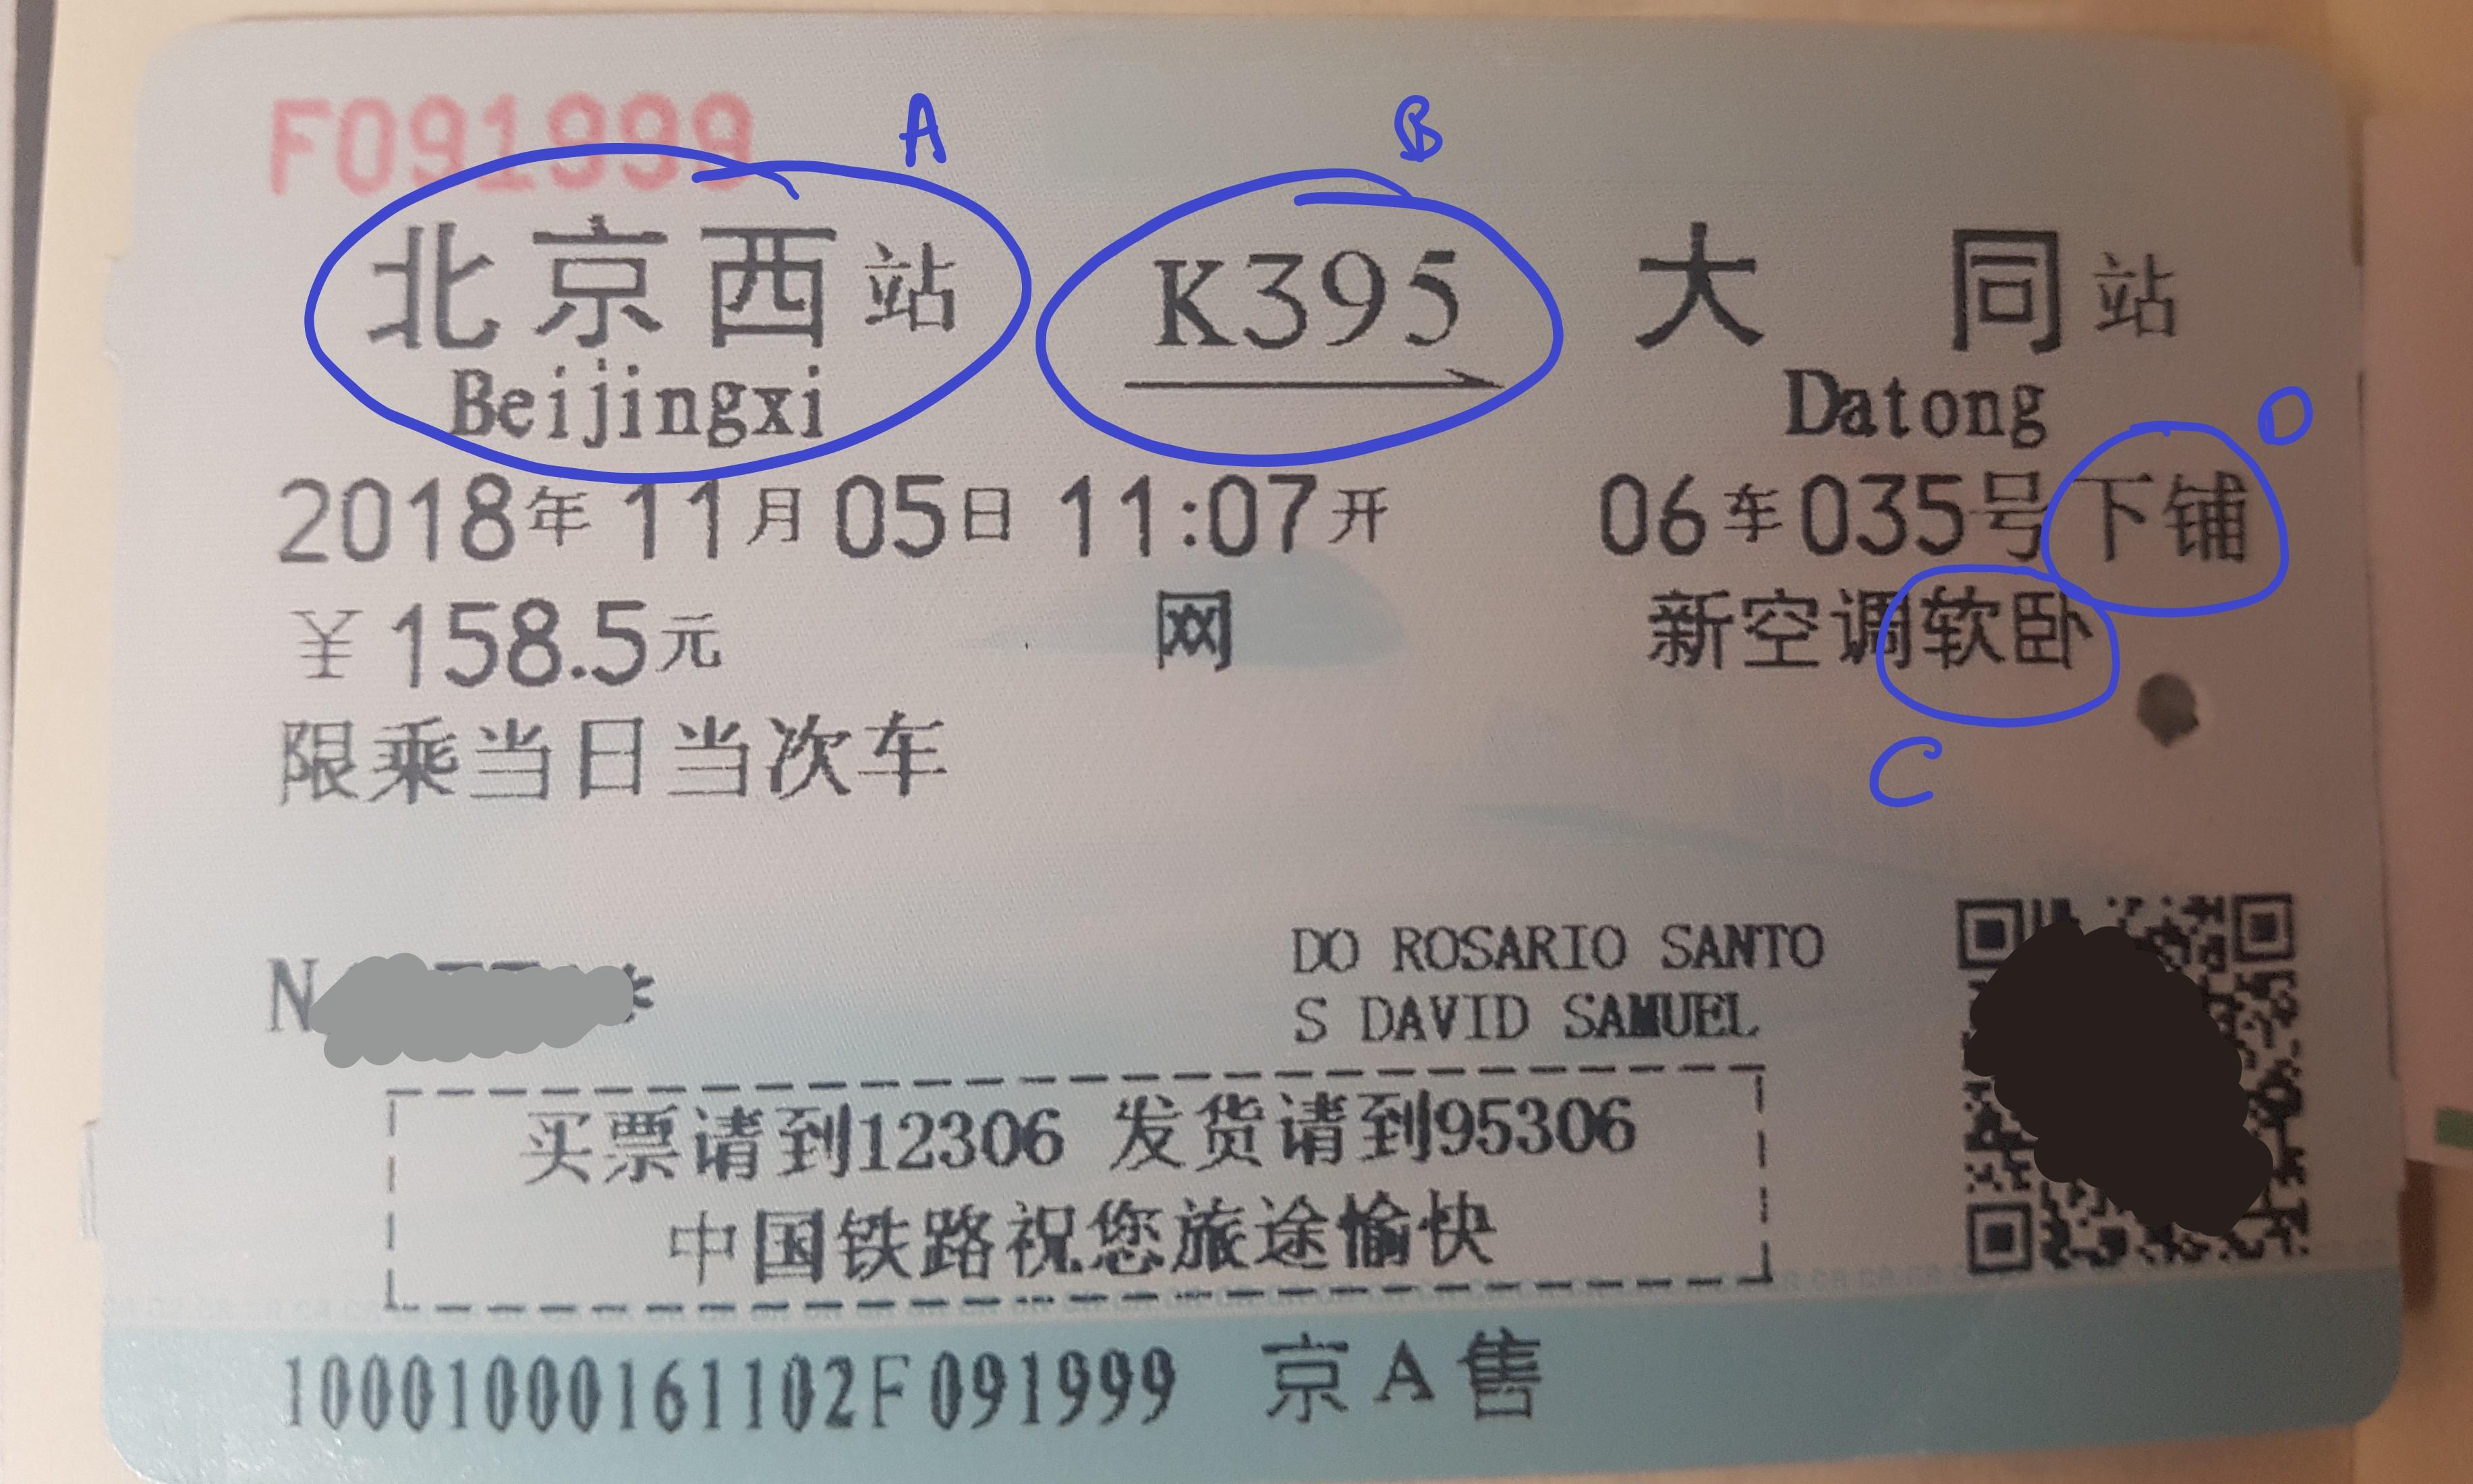 Bilhete de classe soft sleeper para comboio na China